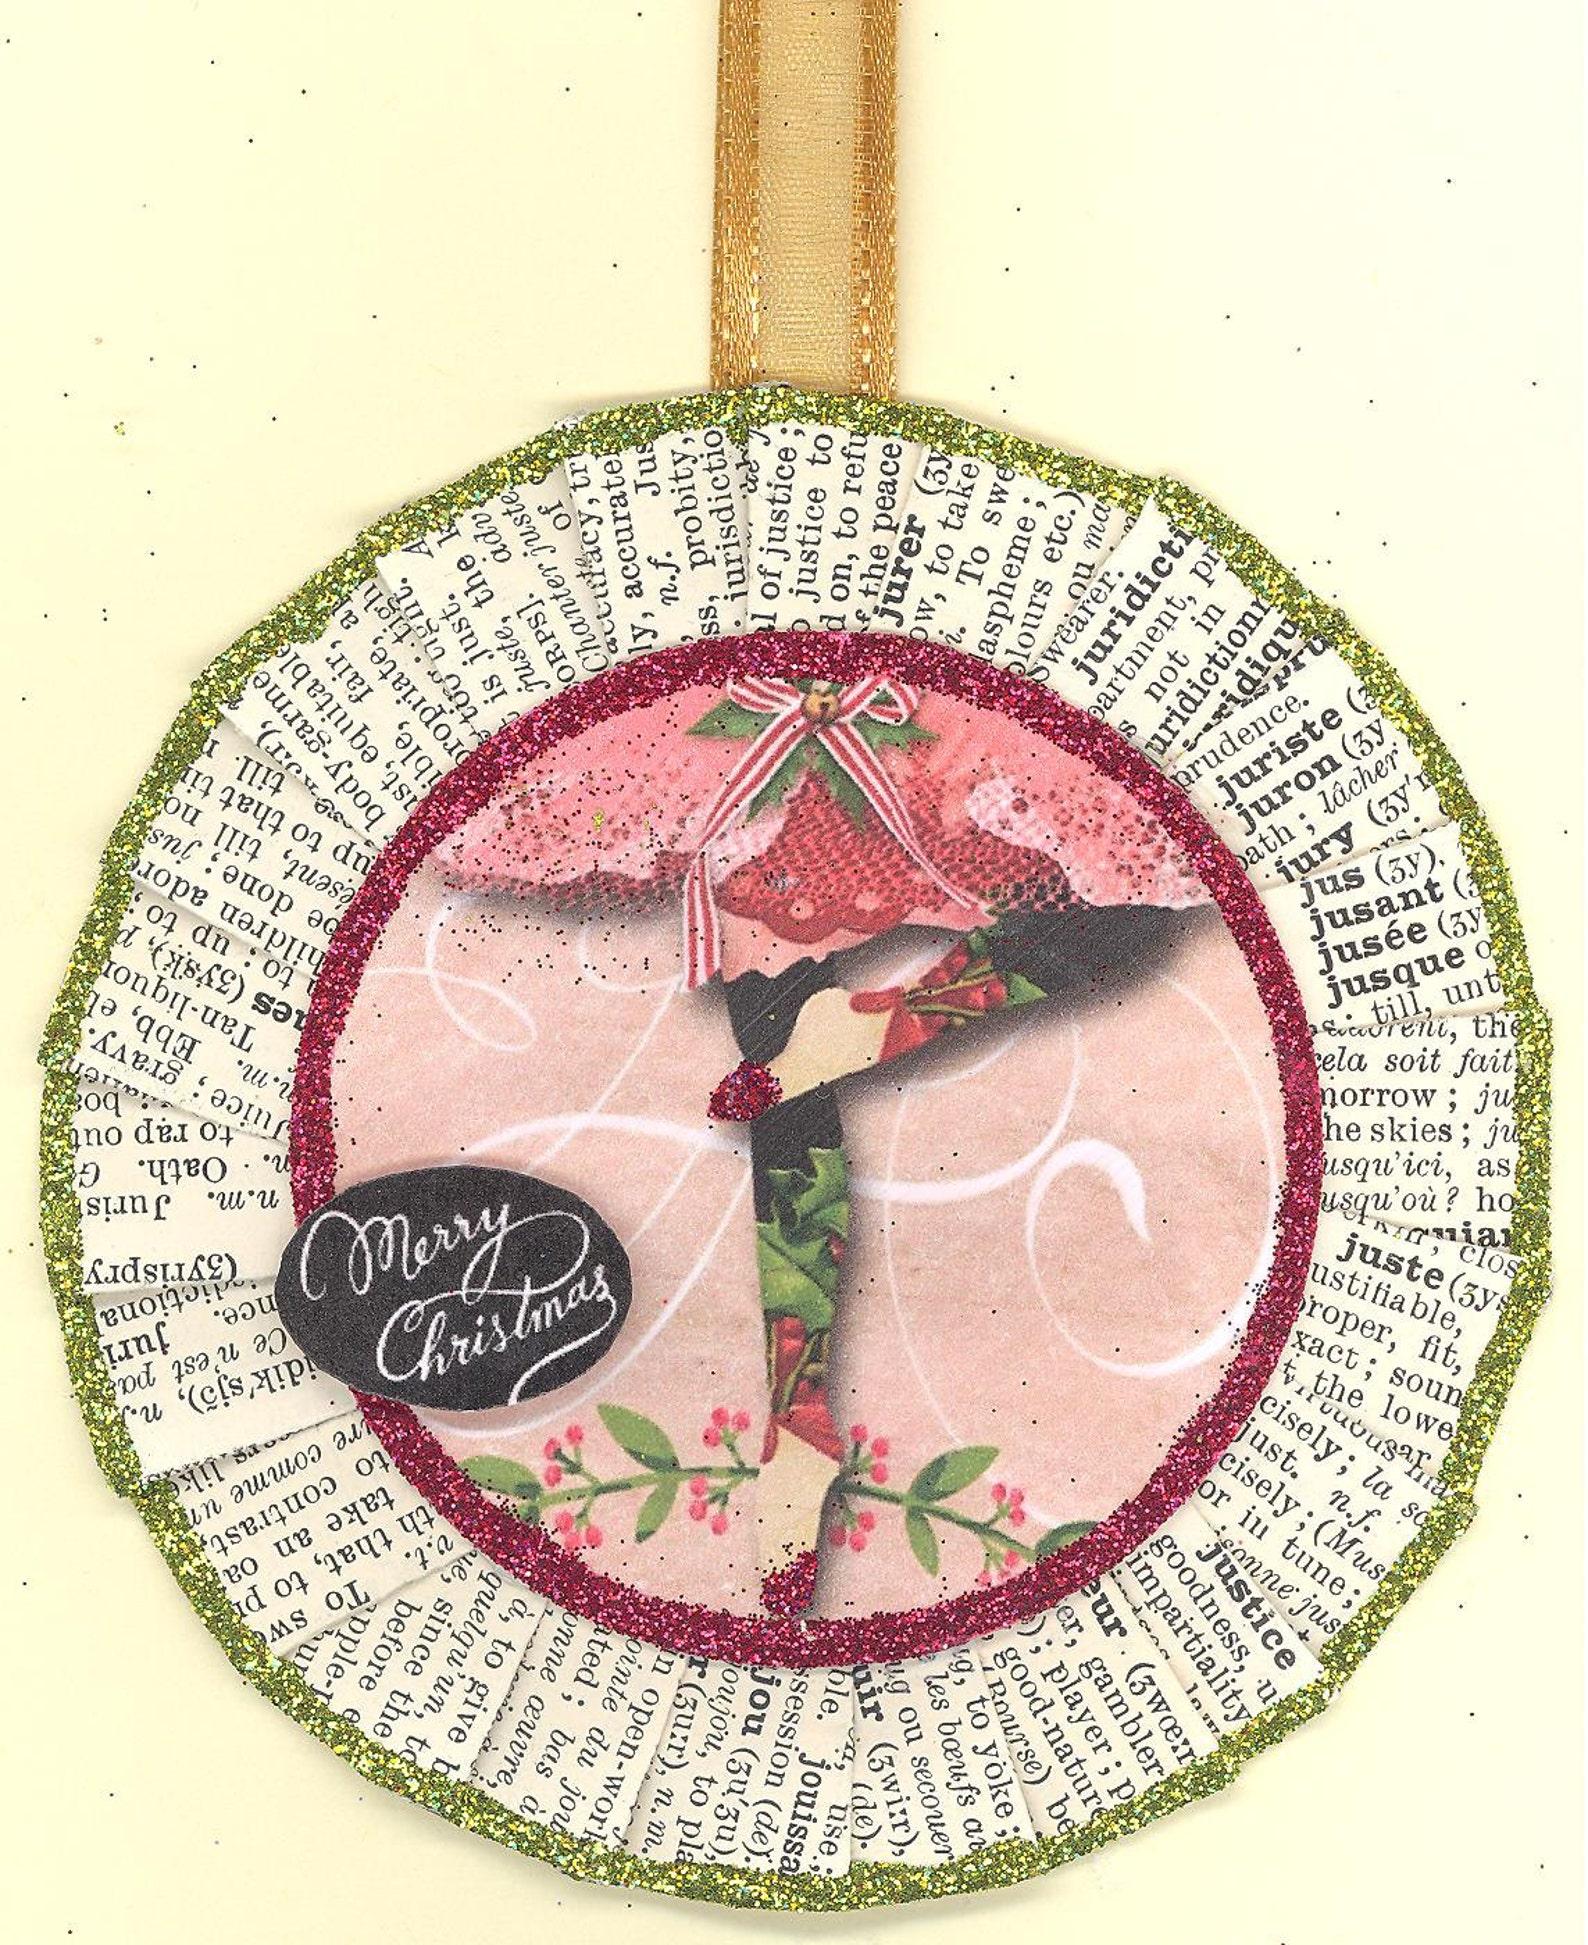 ballerina | ballet dancer | nutcracker | sugar plum fairy | christmas ornament | vintage style